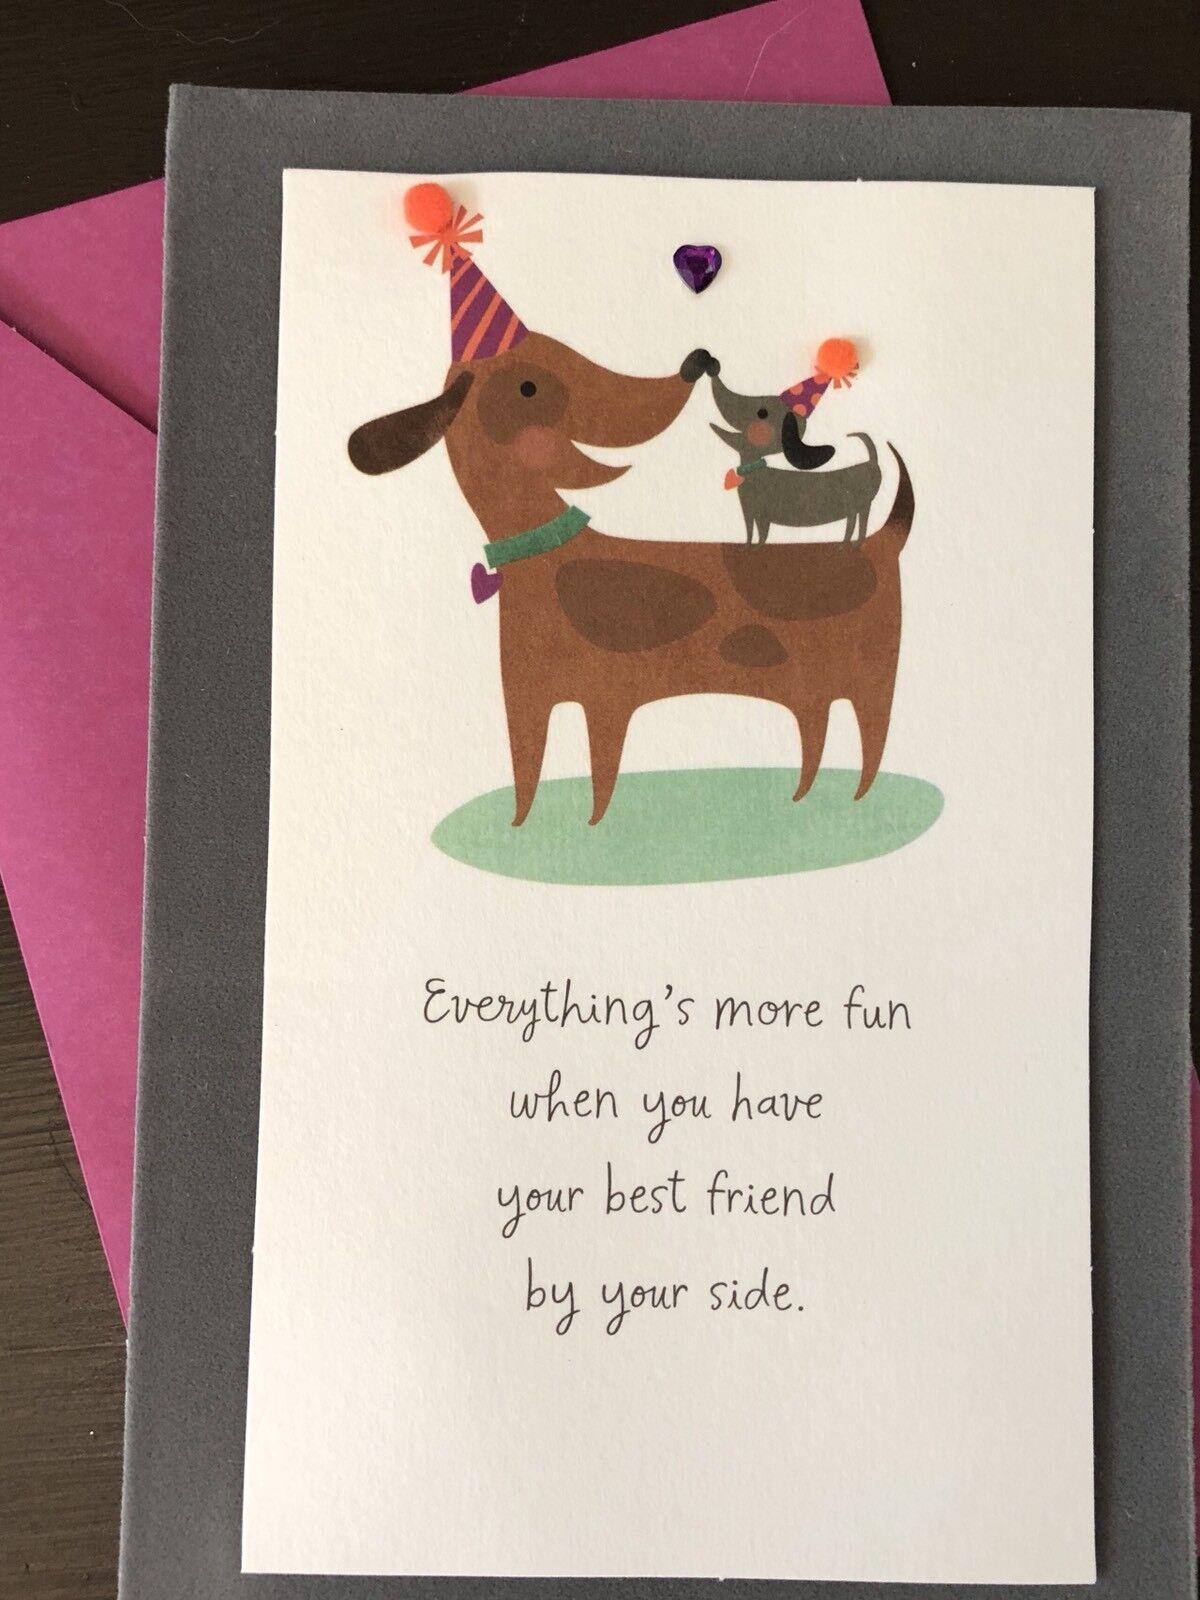 Papyrus Christmas Cards Dachshund Dog Holiday 1 Box 12 Cards Envelopes /& Seals